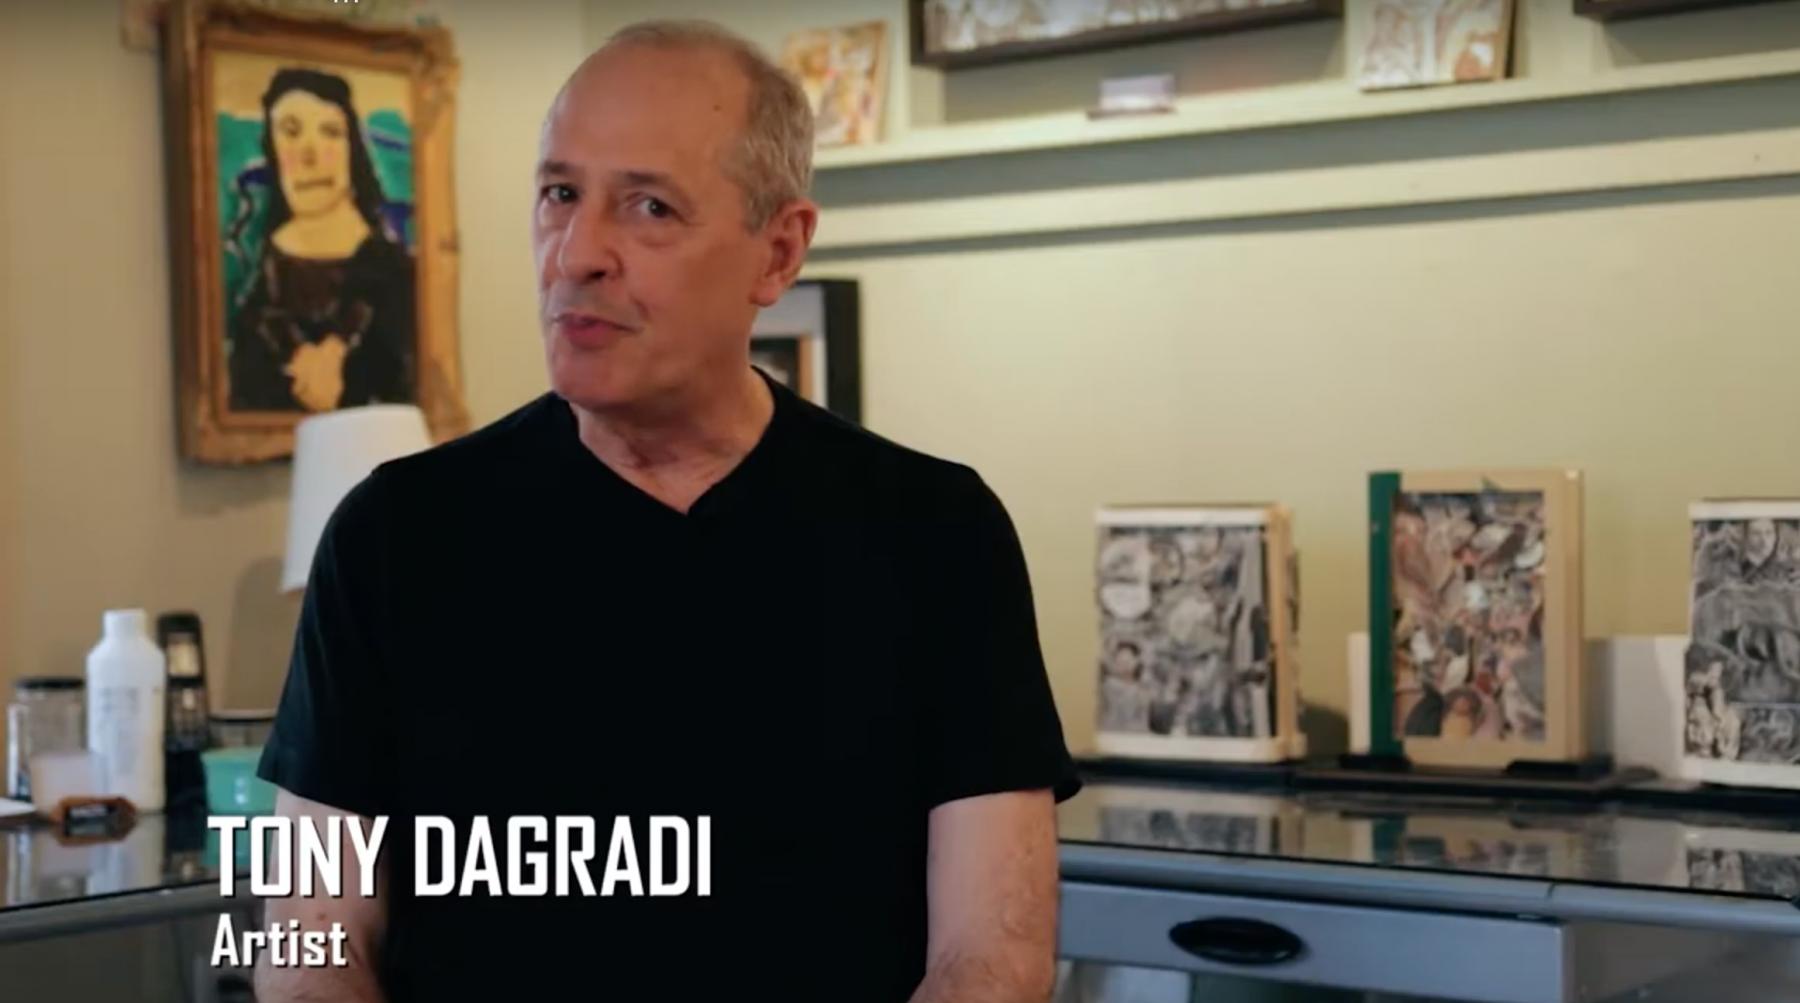 Tony Dagradi ||| Diffusion, 18 July - 30 August 2019